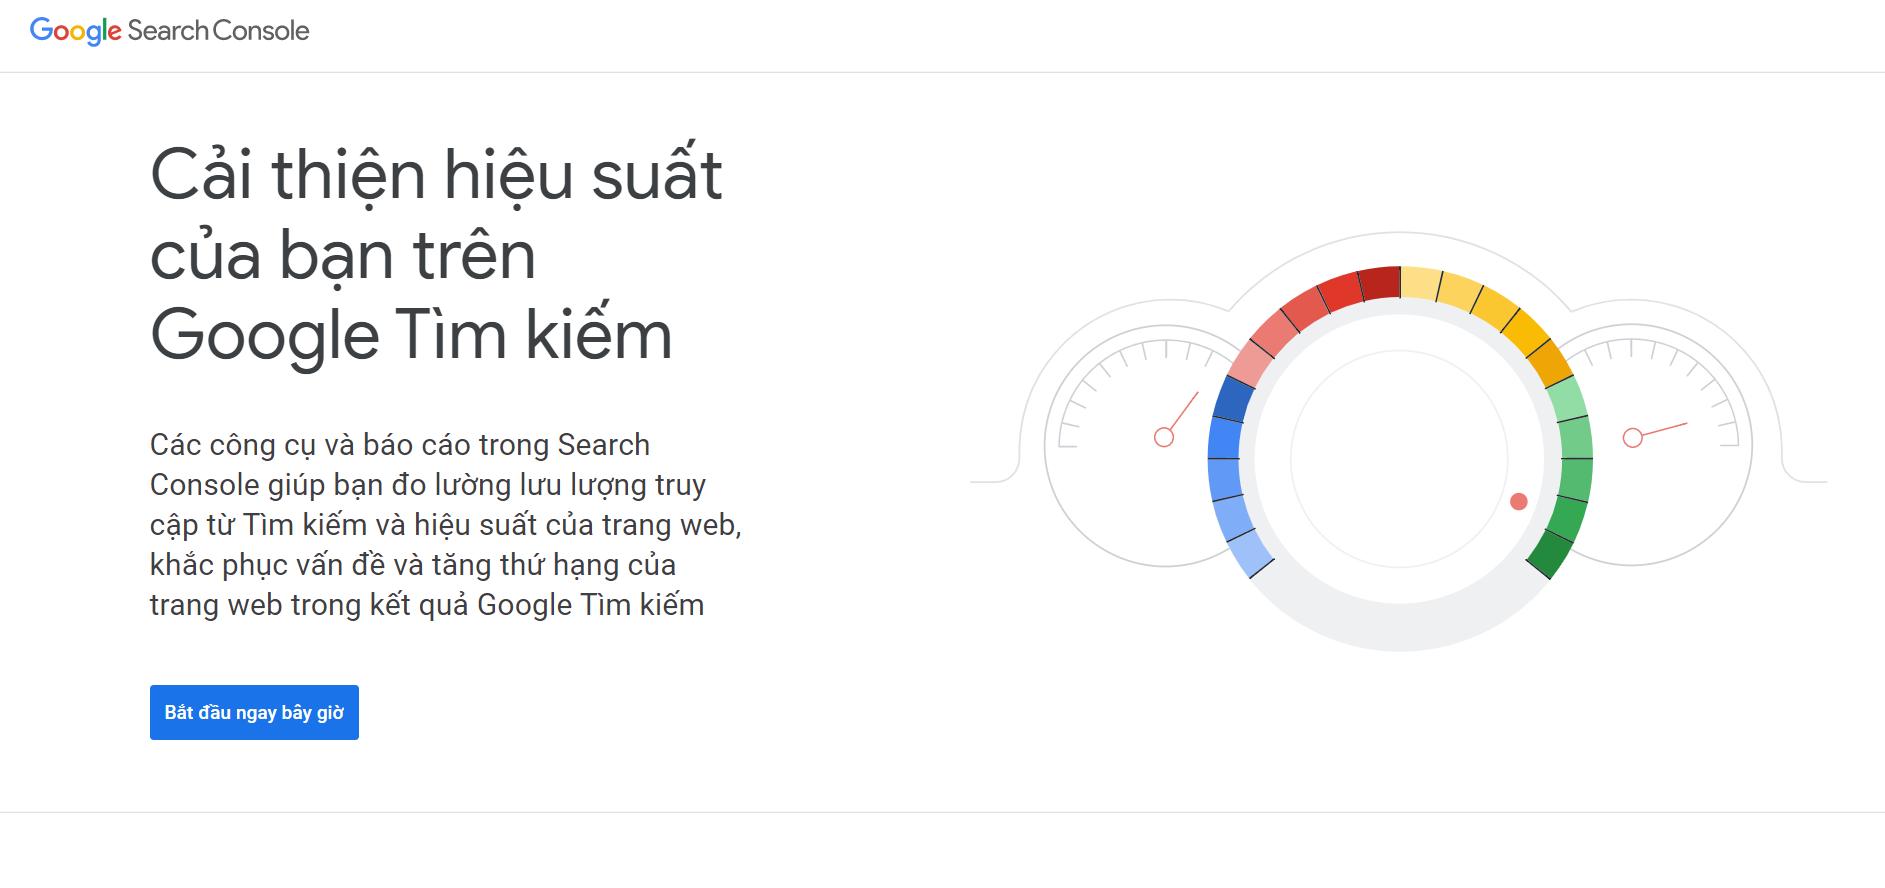 Google Webmaster tools - Hướng dẫn sử dụng Google Search Console